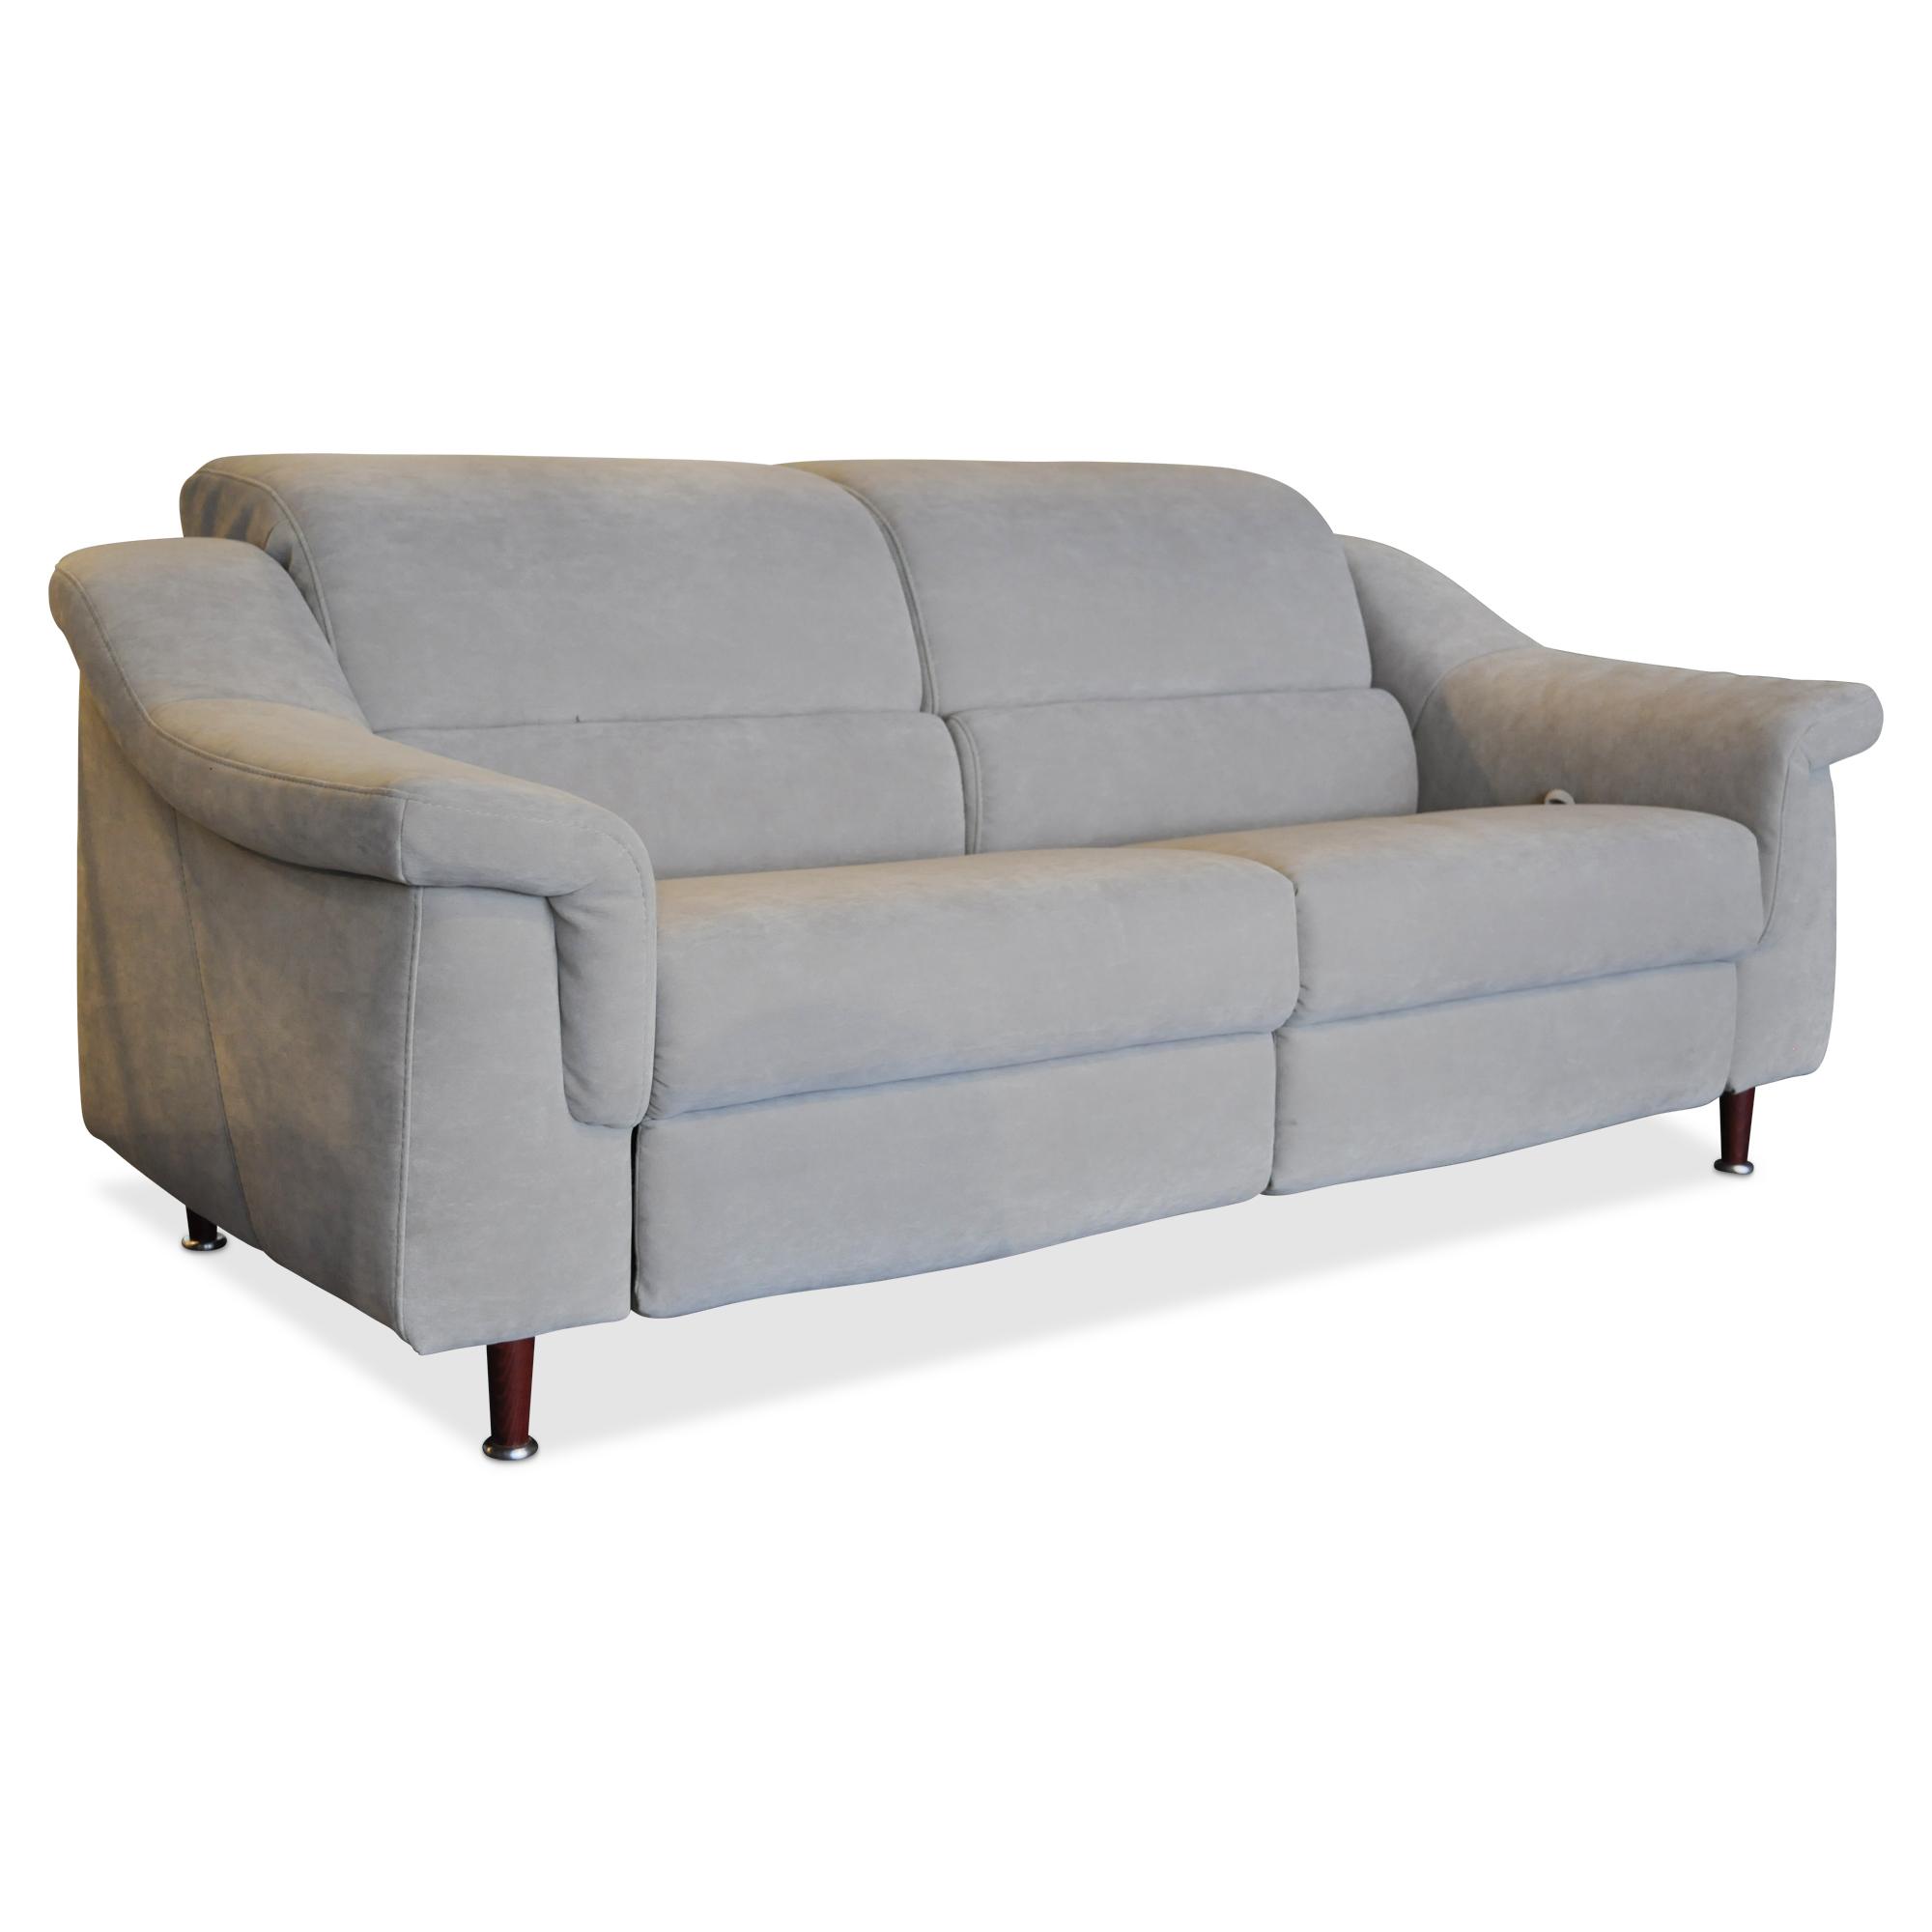 Sofa Platinum Himolla Sofas Günstig Kaufen Möbelfirst